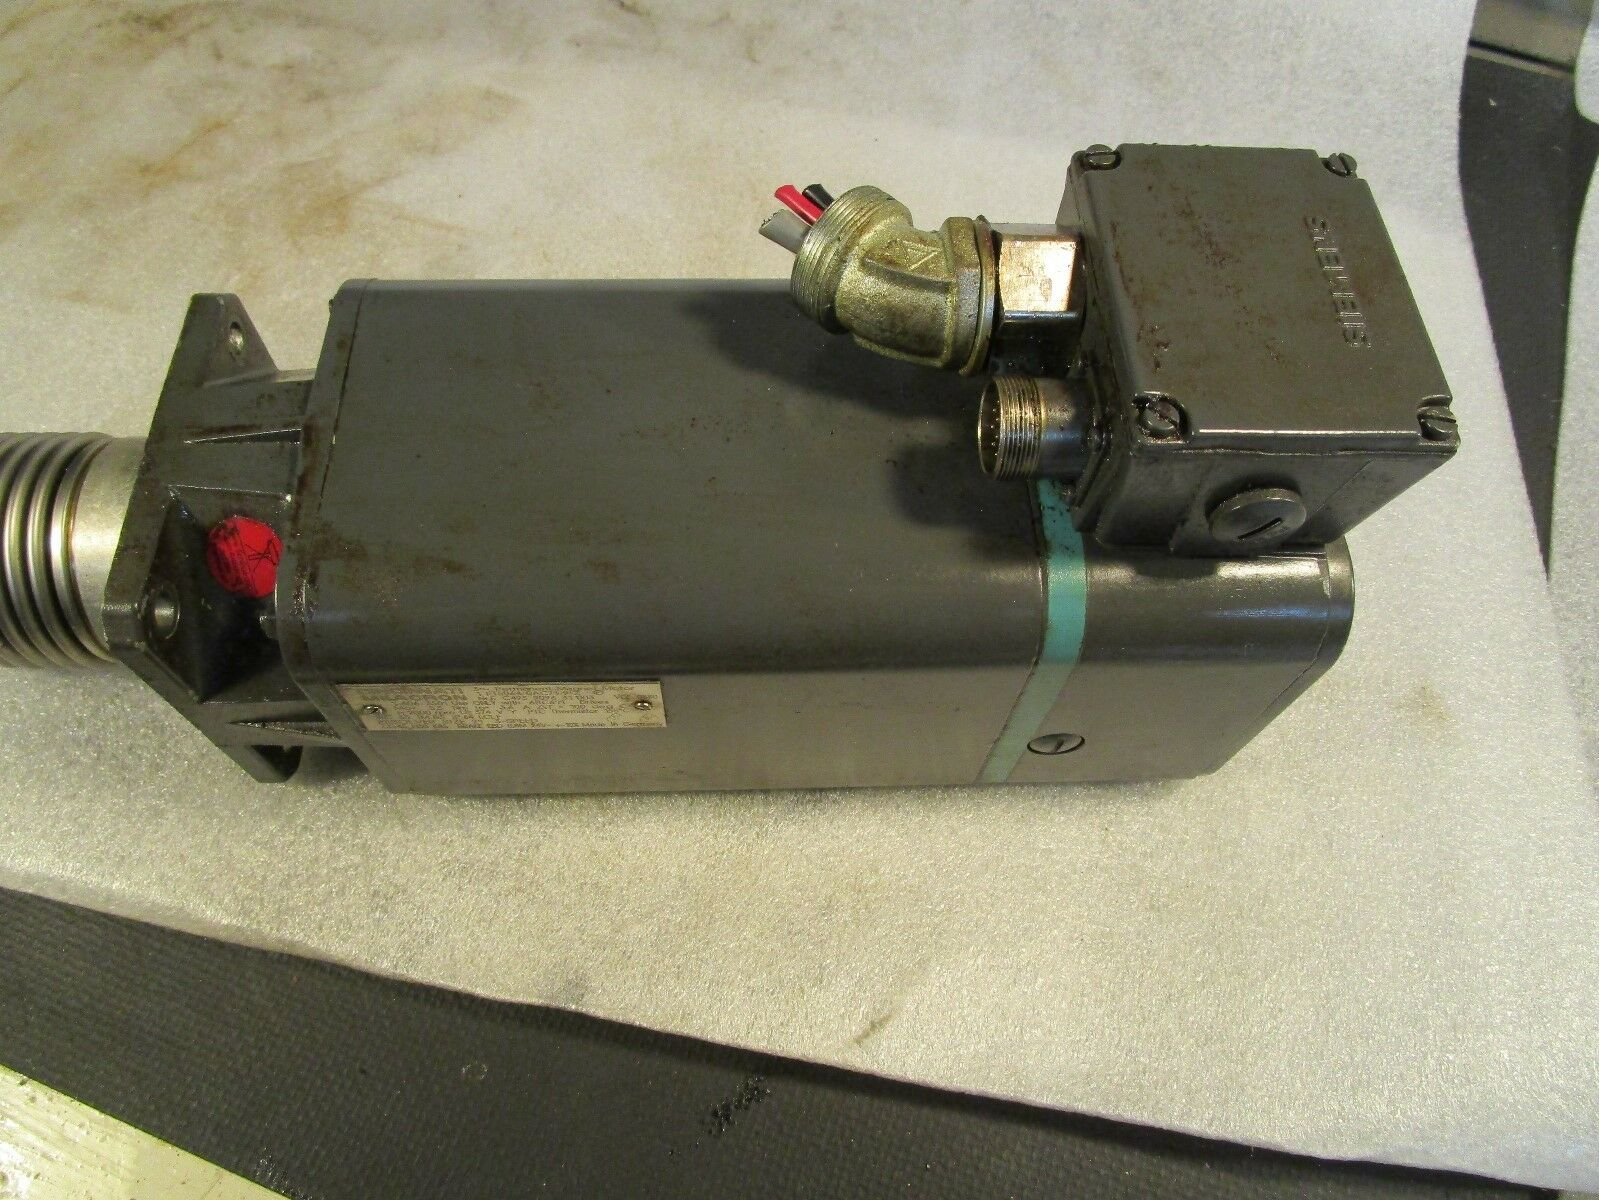 Siemens AC Servo Motor 1FT5064-0AC71-9-Z CMI Part# 1-606-3501, CINCINNATI MILACRON, 3~ Permanent-Magnet-Motor.